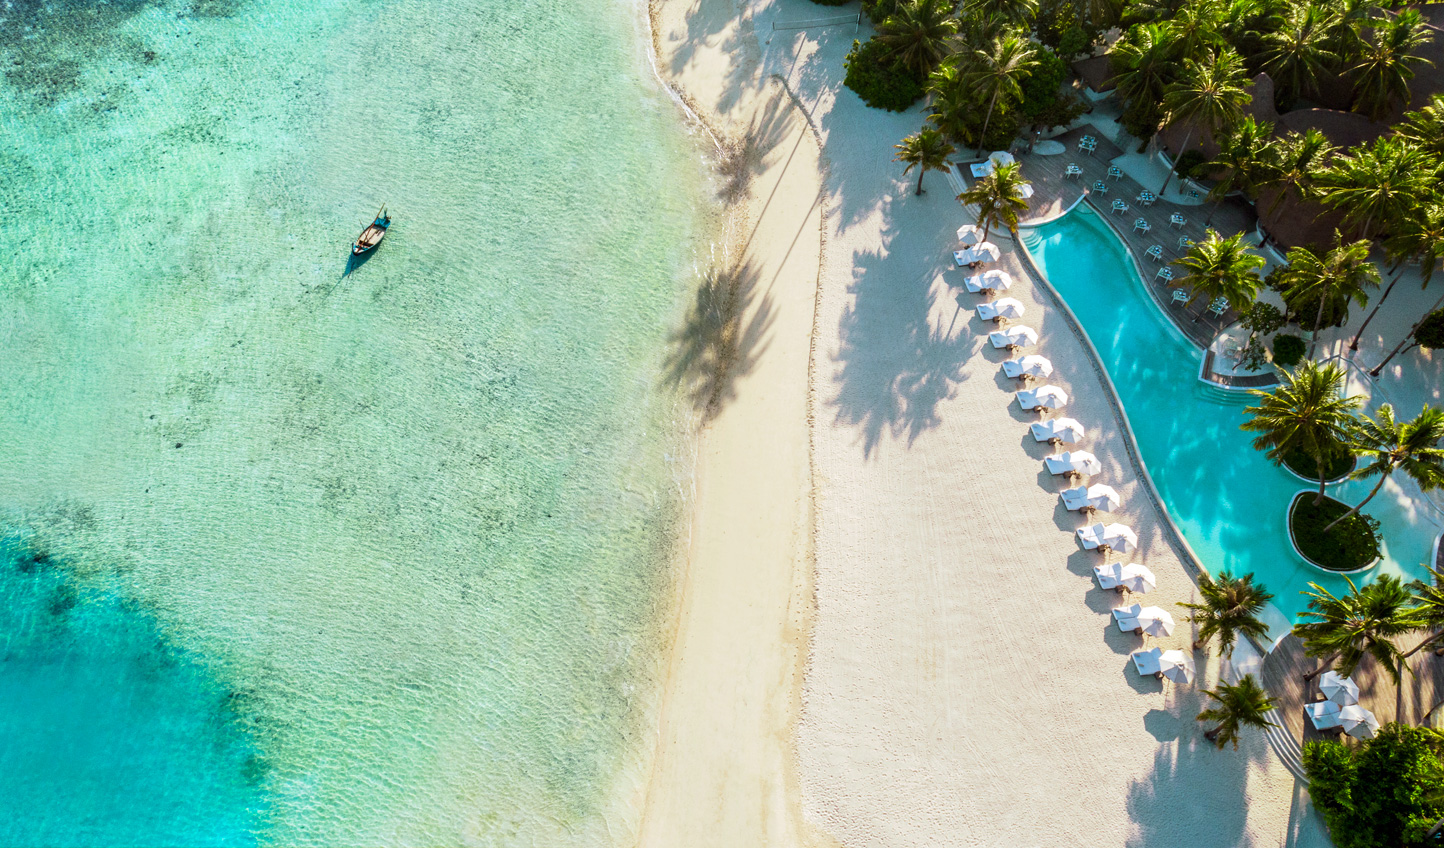 A tropical oasis awaits